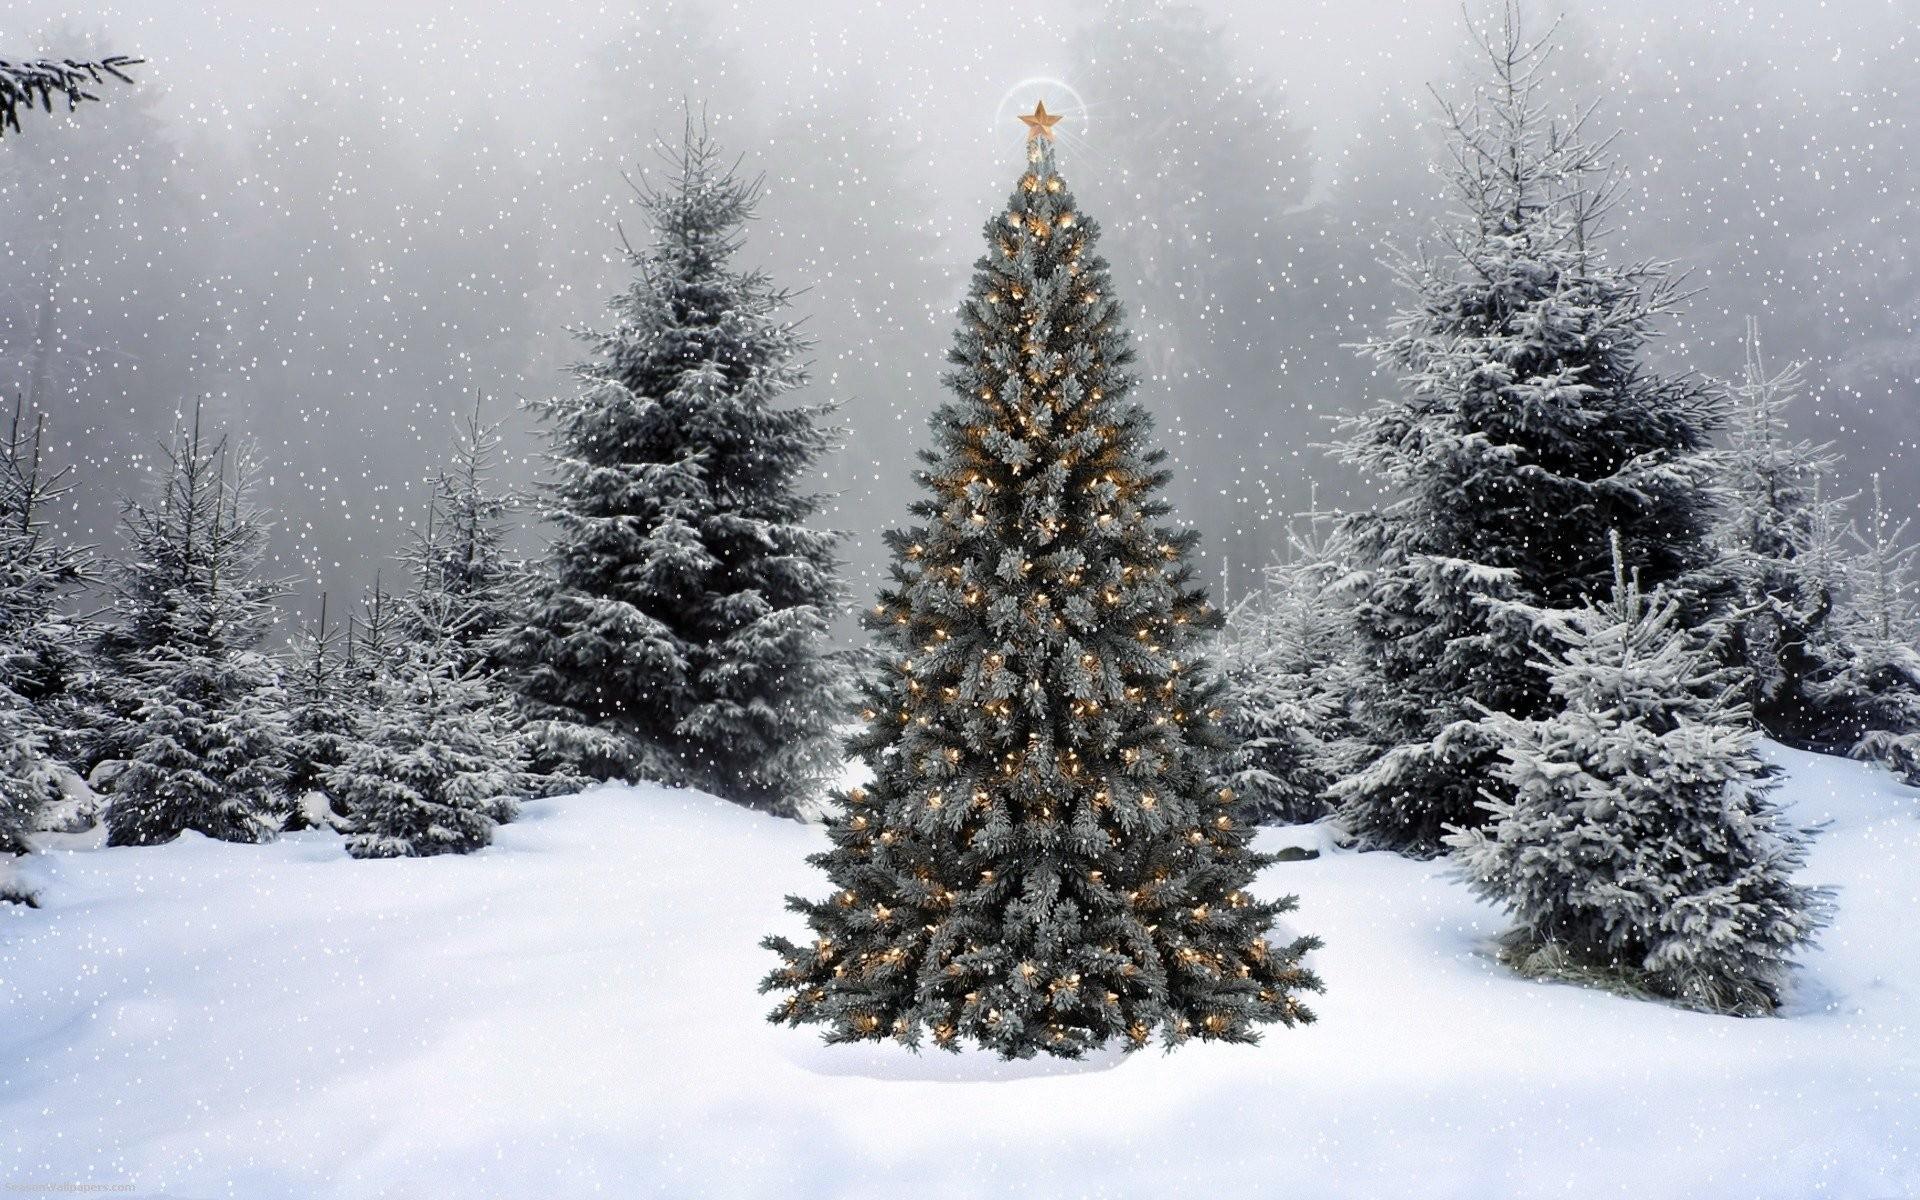 Christmas Tree In Snow Wallpaper